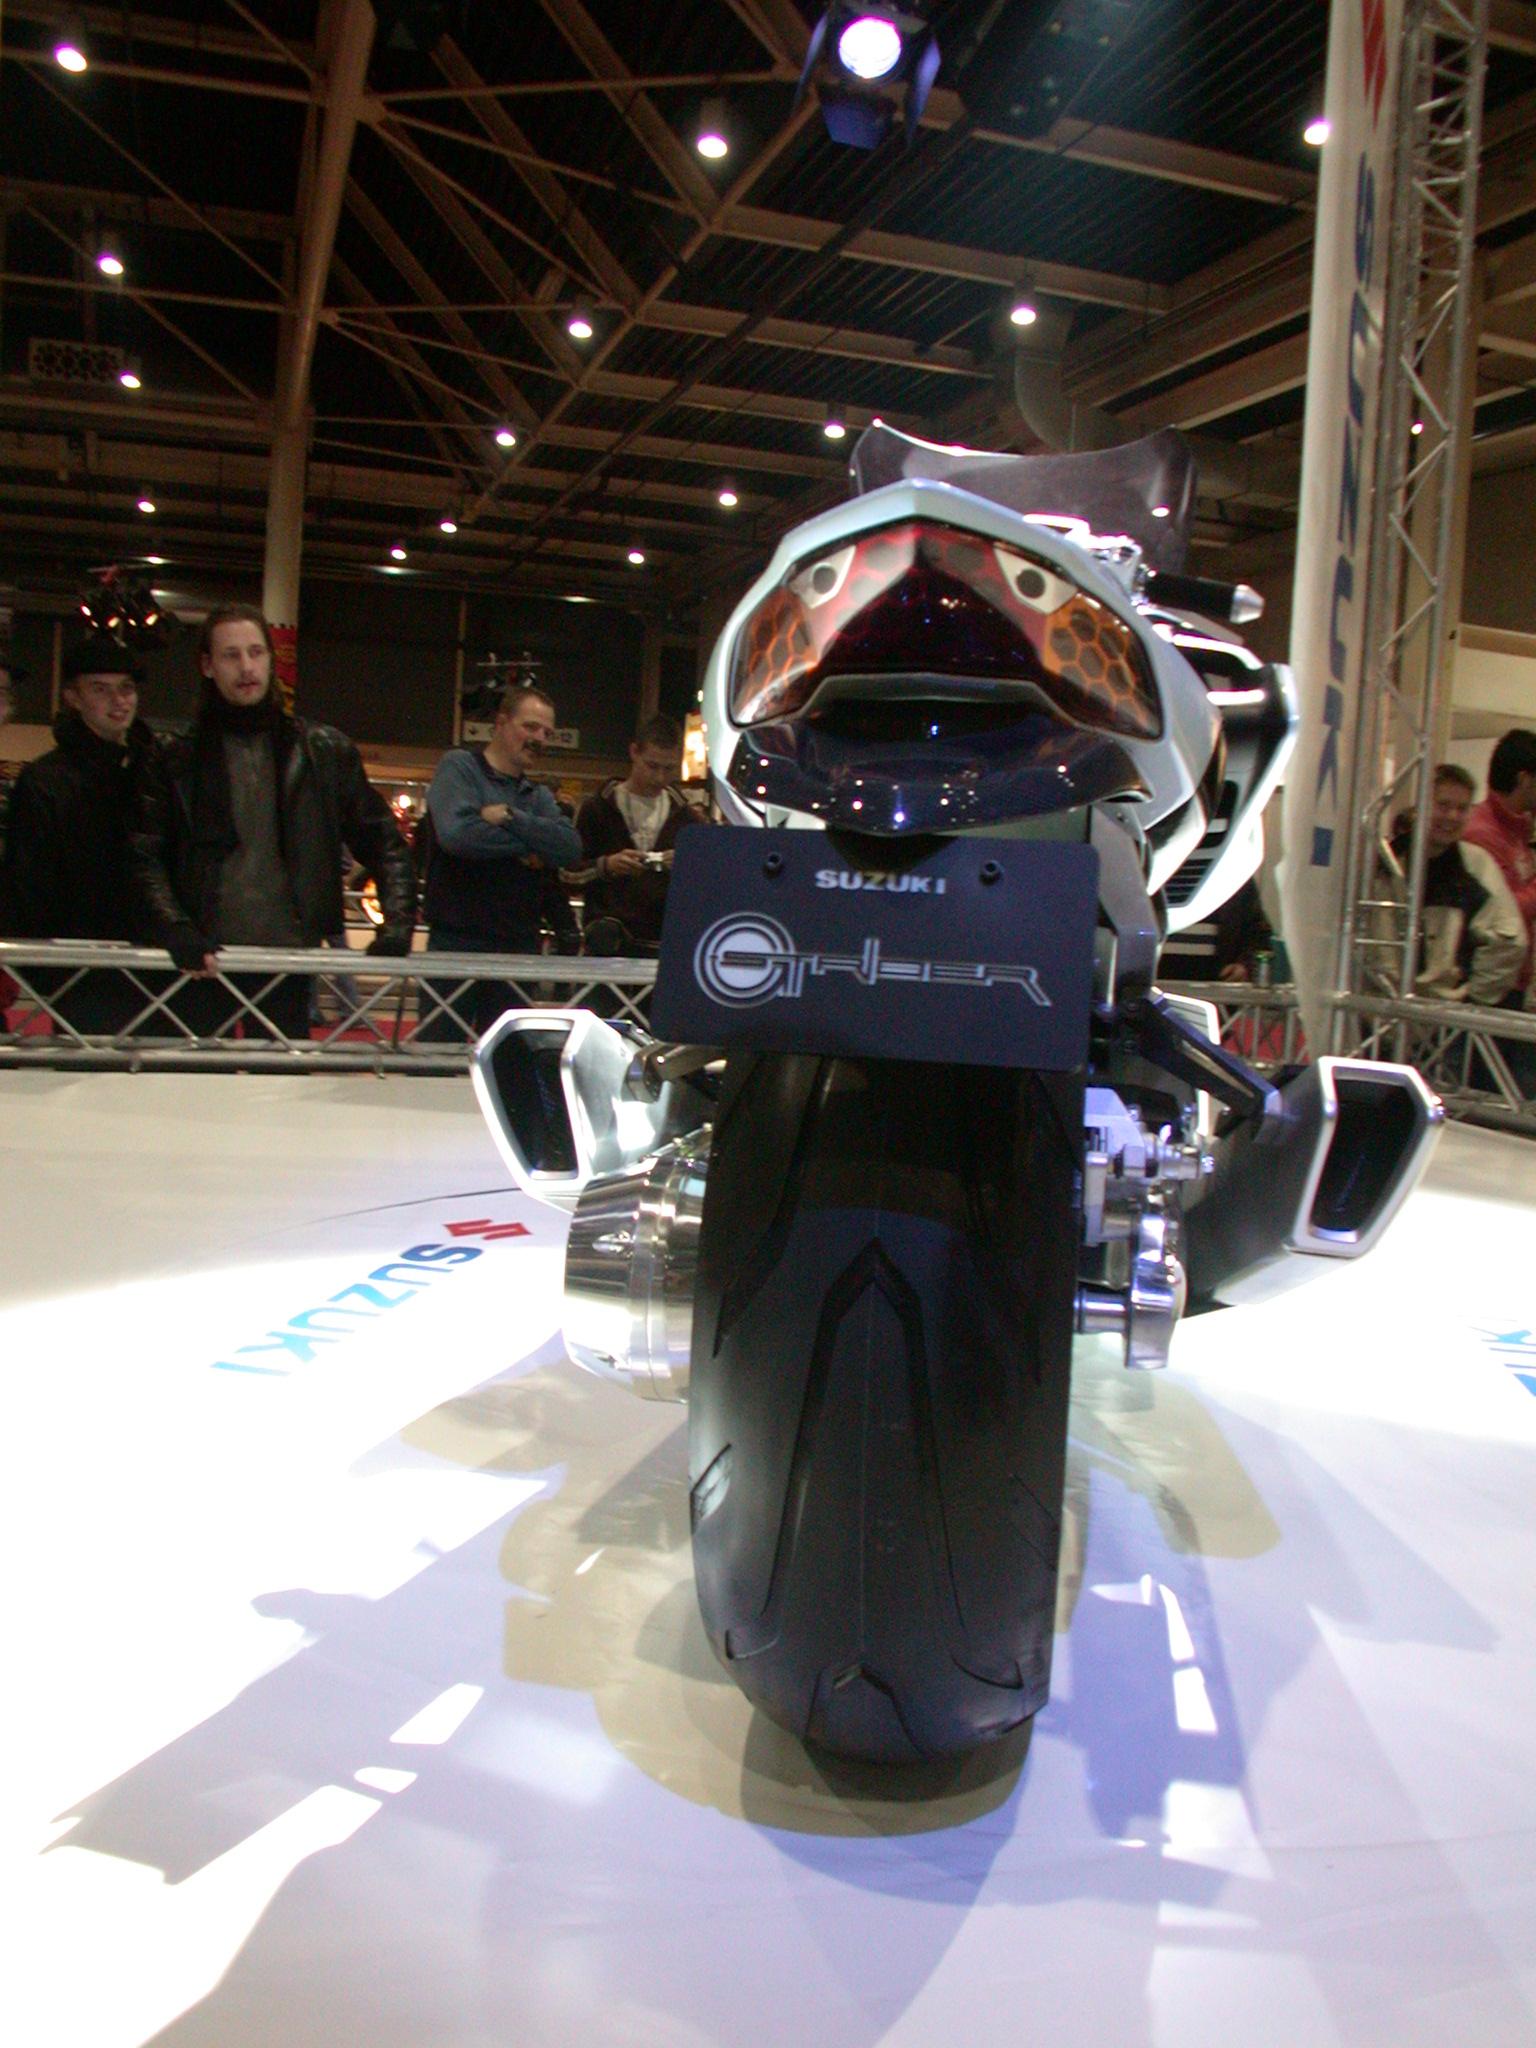 concept bike motorbike motorcycle futuristic show bikeshow glossy tire